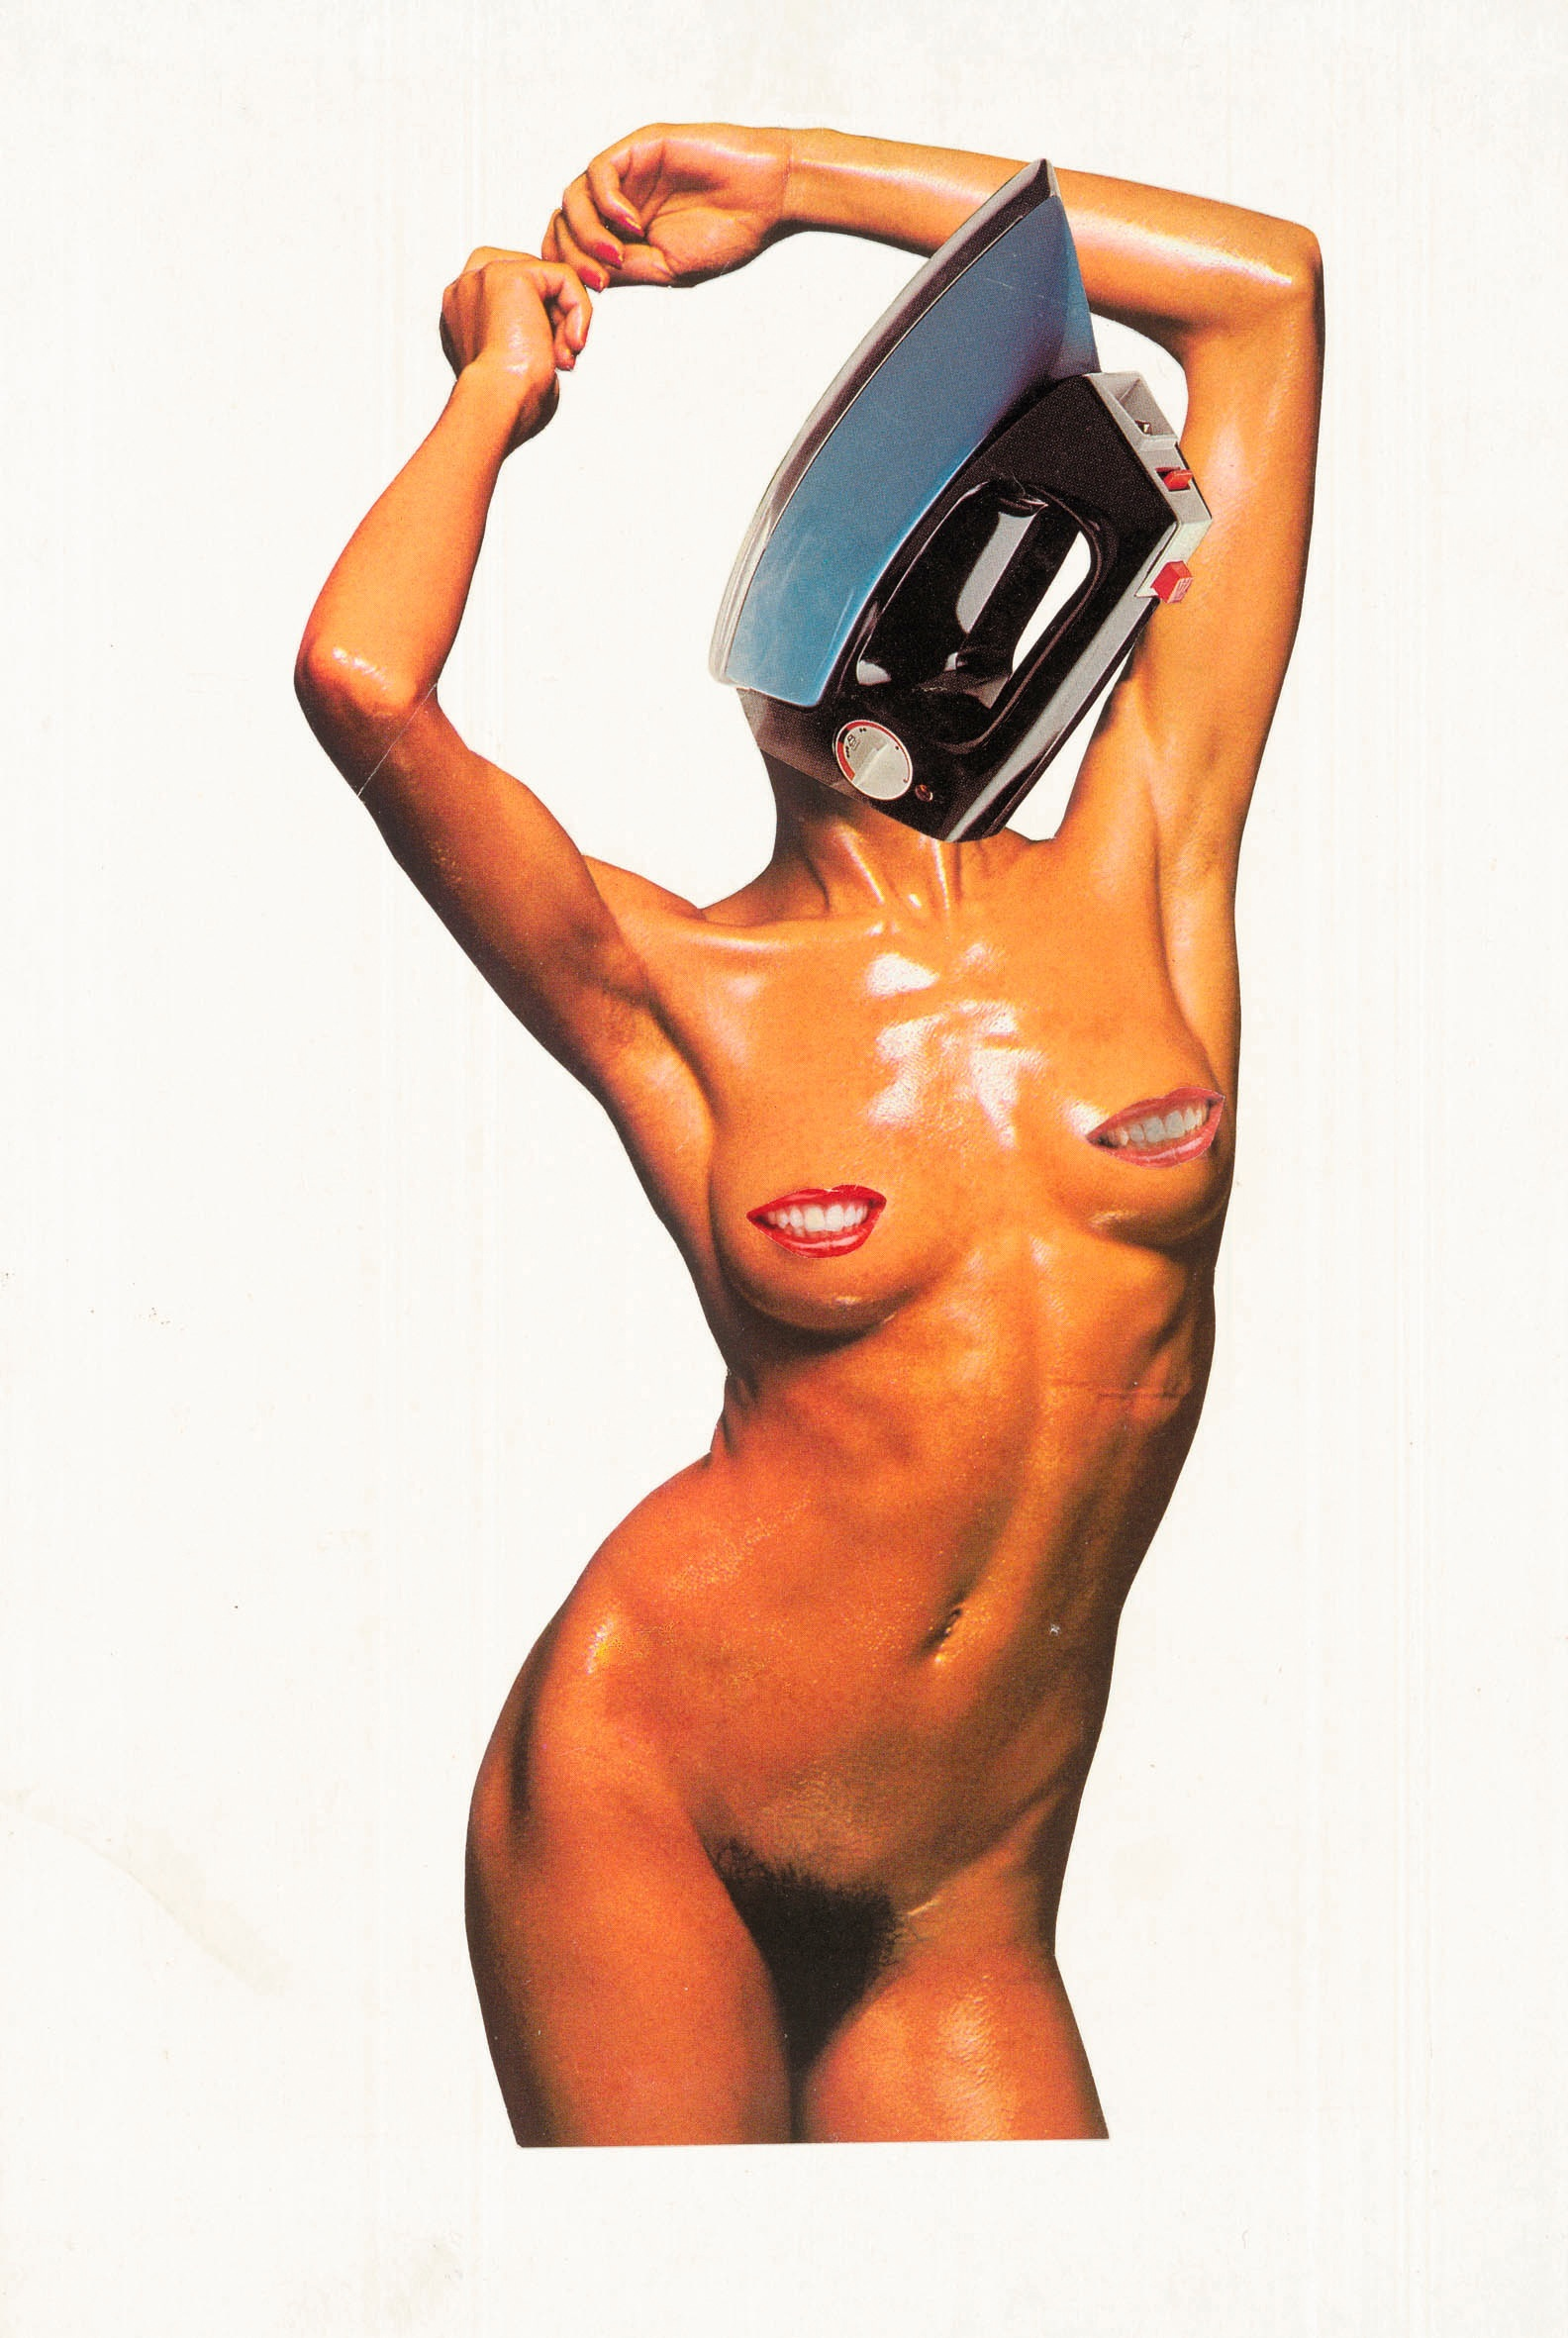 Linder Sterling,  Untitled , 1977, photomontage, 32.9 X 21.5 cm, Tate, London.